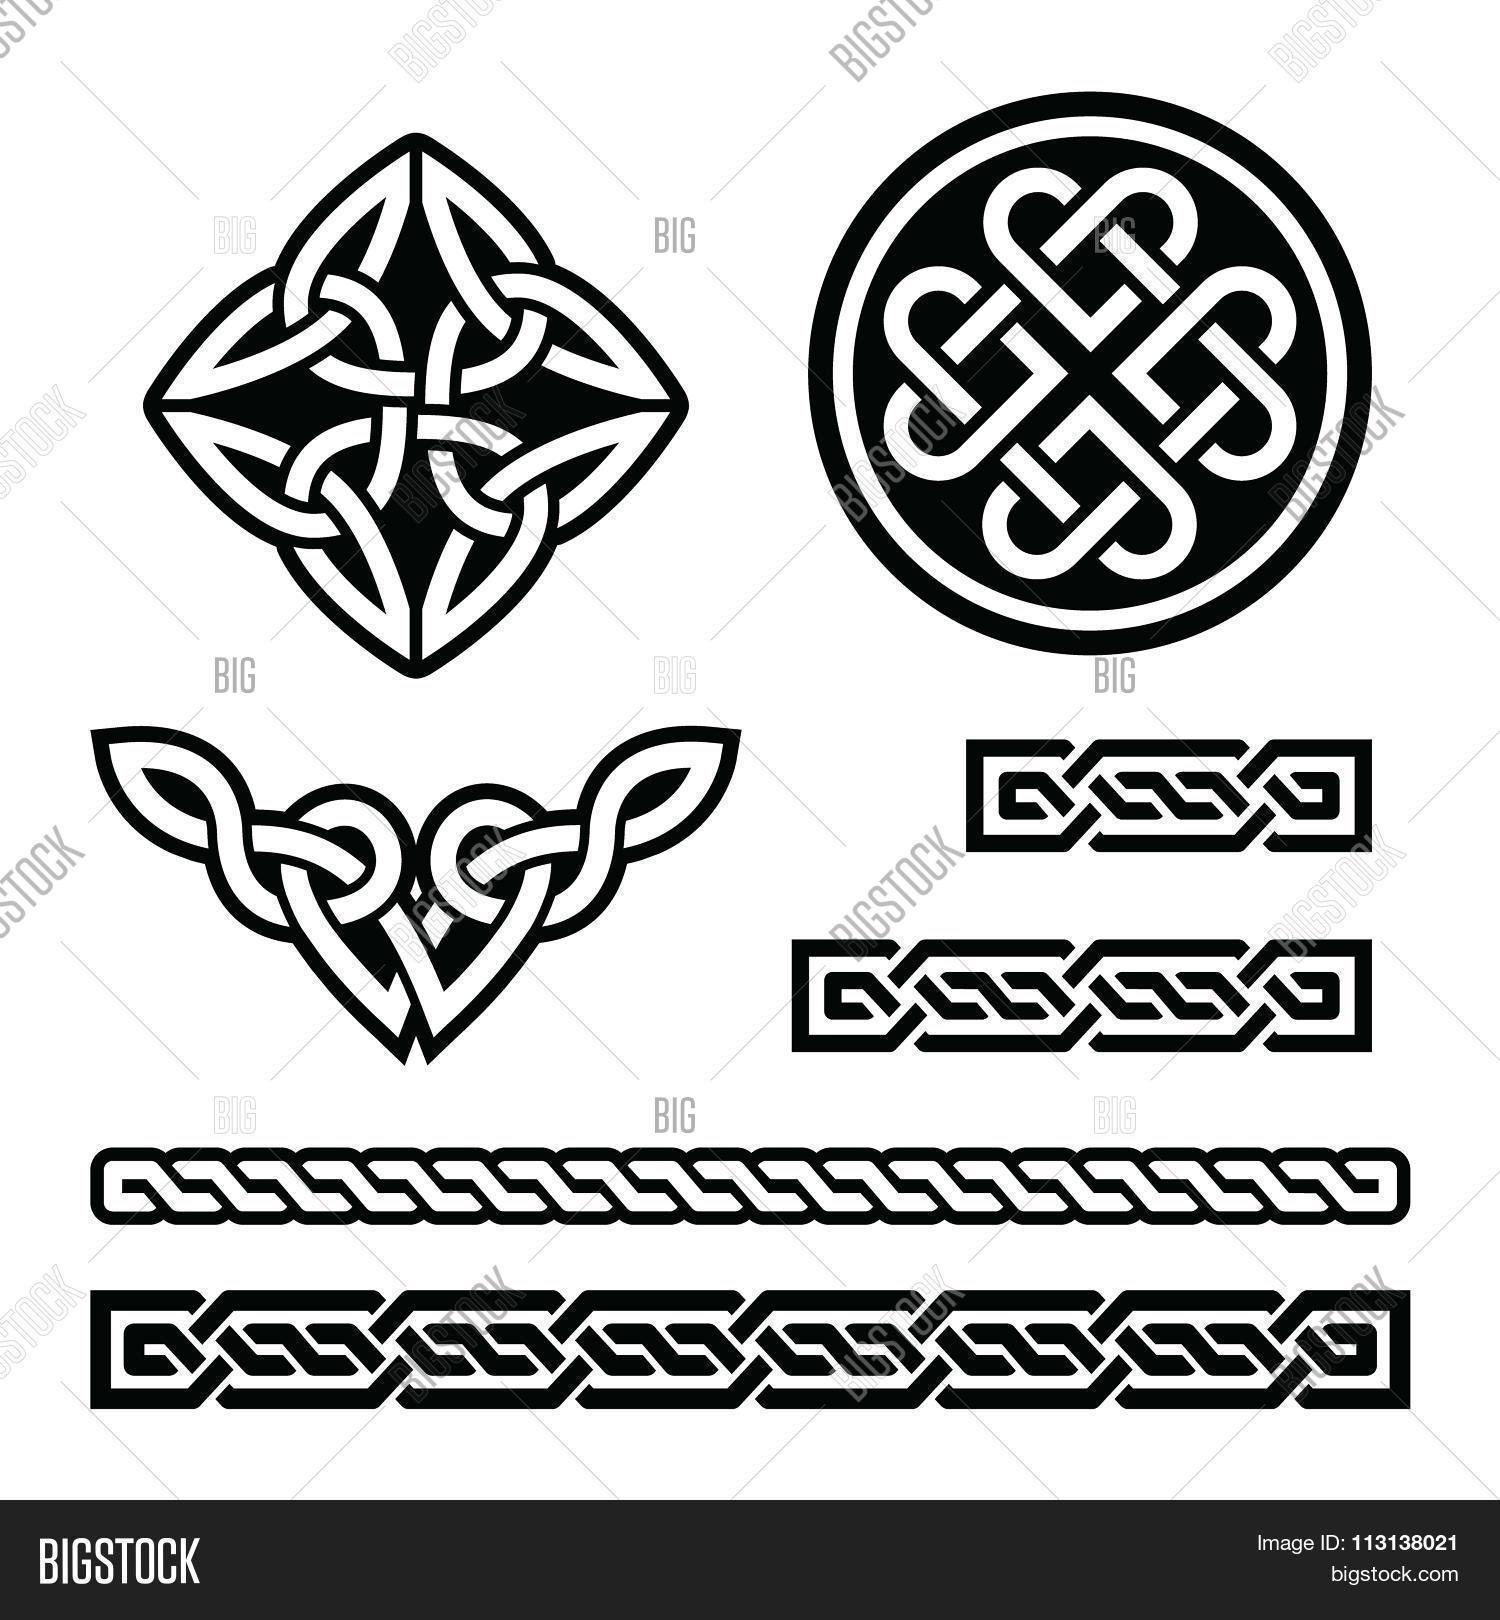 Irish Patterns New Inspiration Design